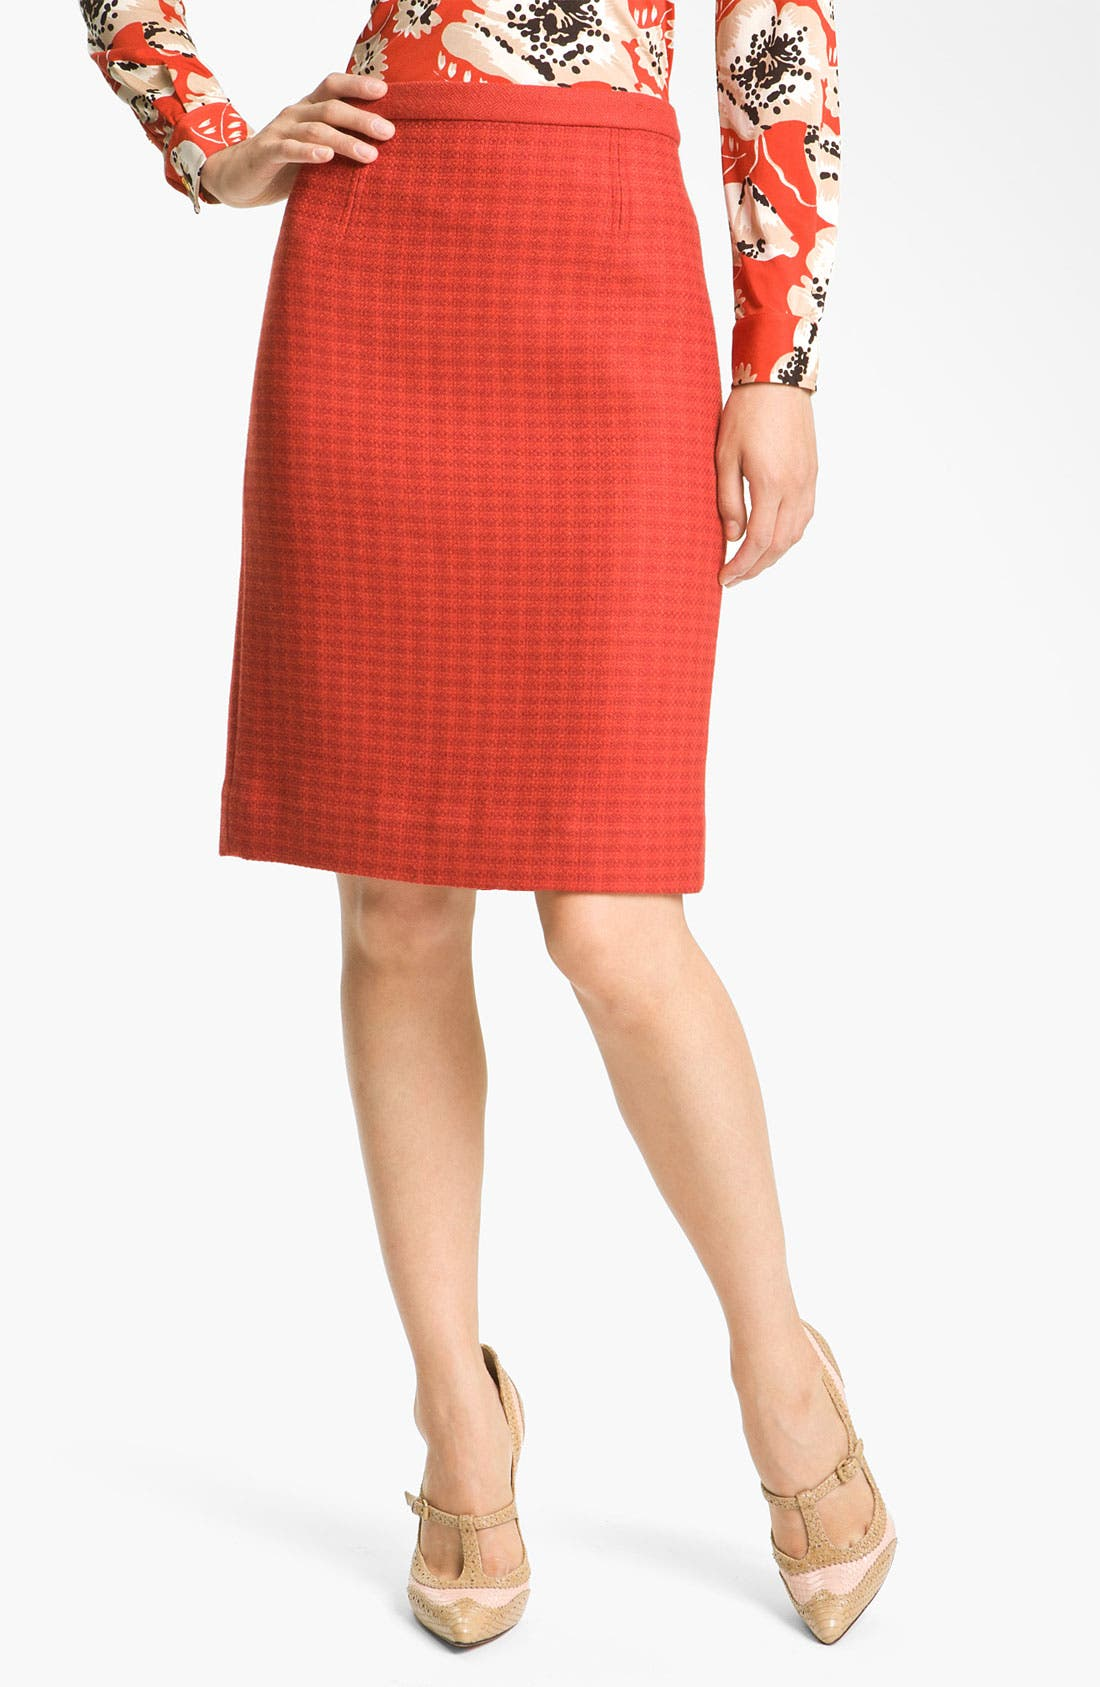 Alternate Image 1 Selected - Tory Burch 'Cornelia' Skirt